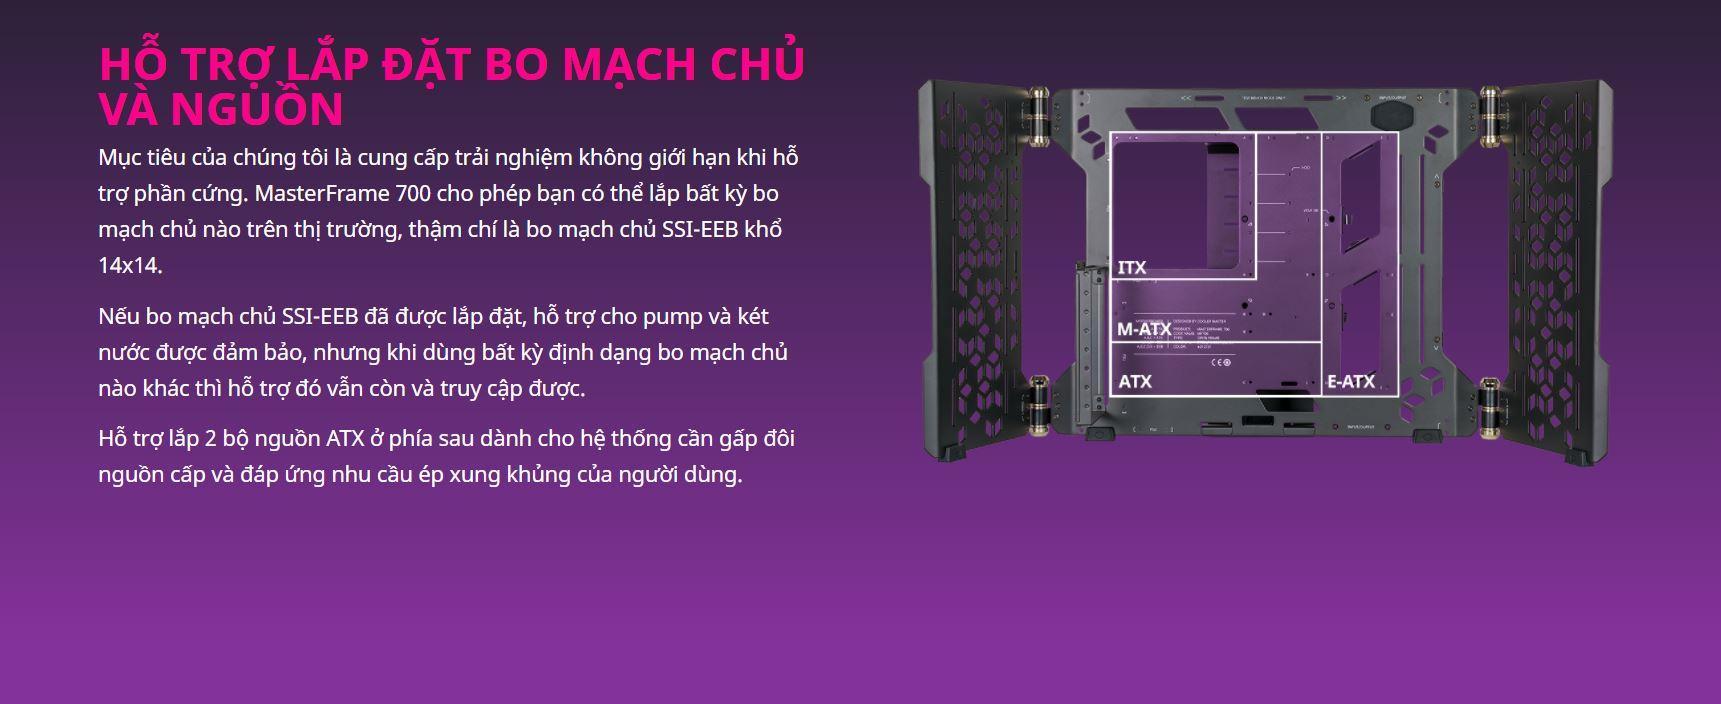 Vỏ Case Cooler Master MasterFrame 700 (Full Tower/Màu Đen) giới thiệu 5